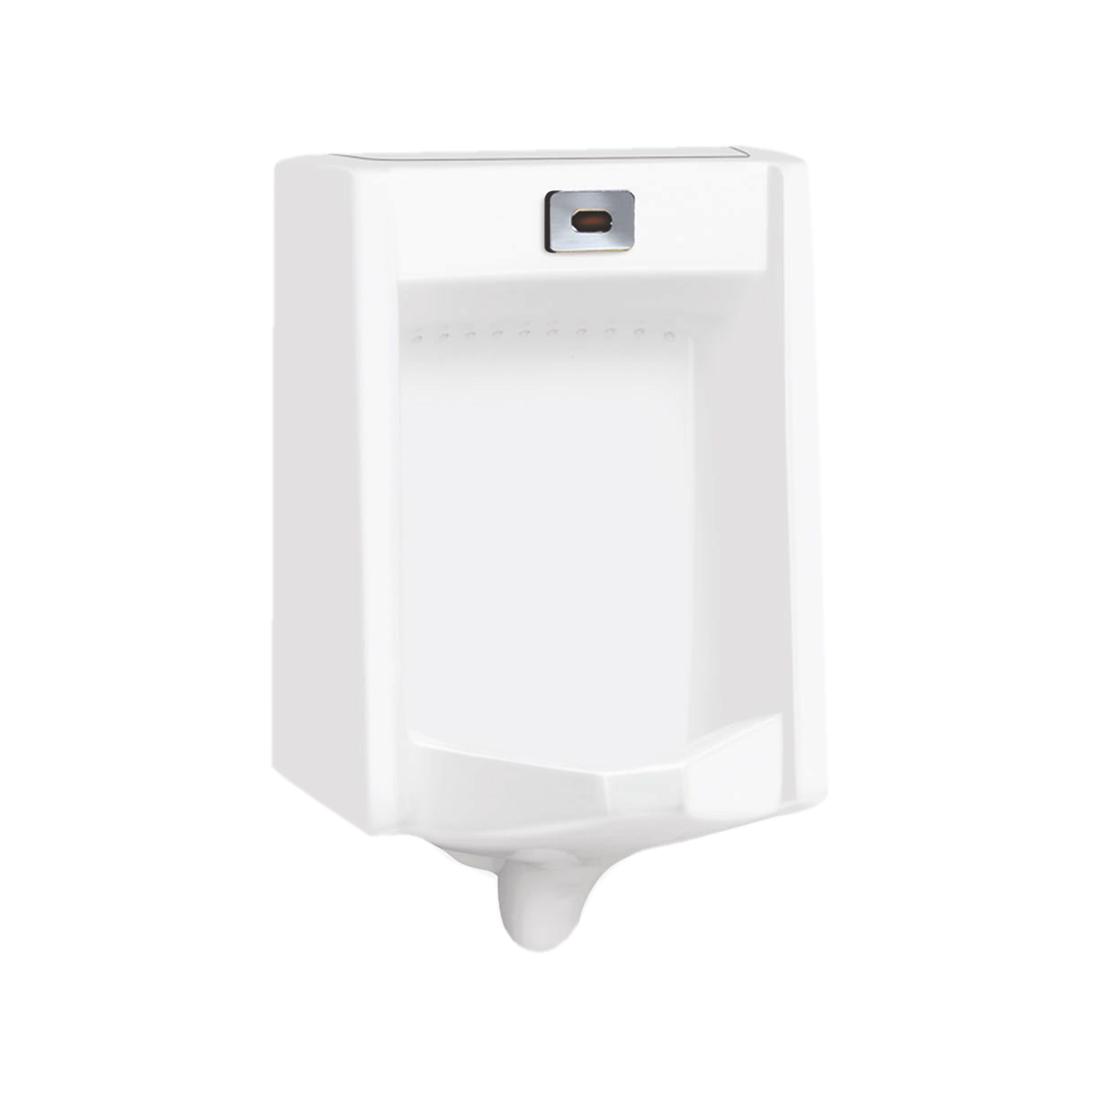 Kerovit Kassava KB7027 Urinal With Sensor